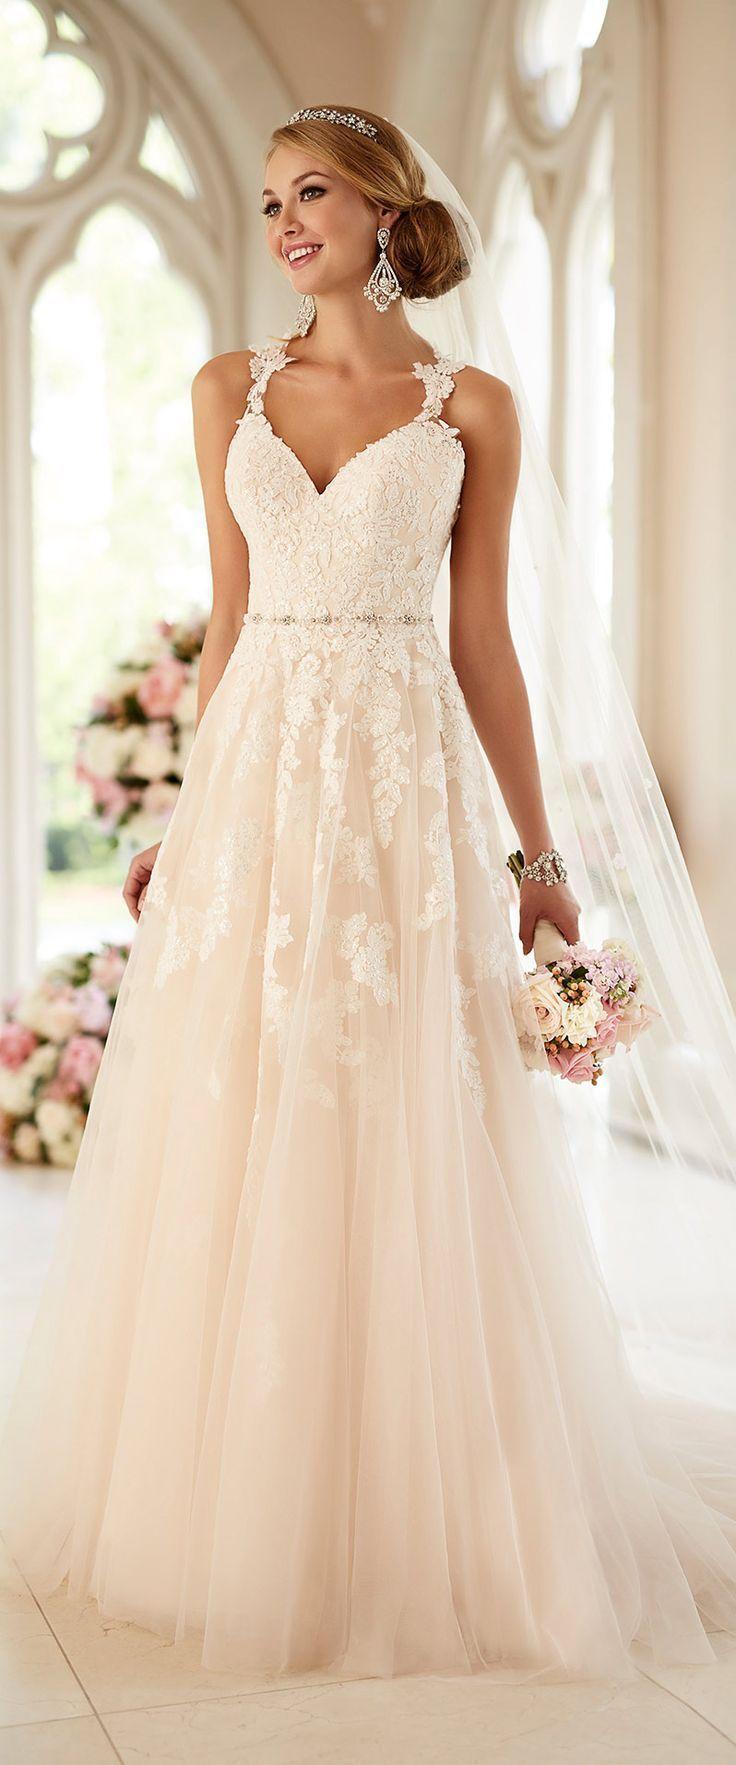 pulchritudinous wedding dresses 2016 lace ballgown princesses strapless 2017 (scheduled via http://www.tailwindapp.com?utm_source=pinterest&utm_medium=twpin&utm_content=post151338959&utm_campaign=scheduler_attribution)